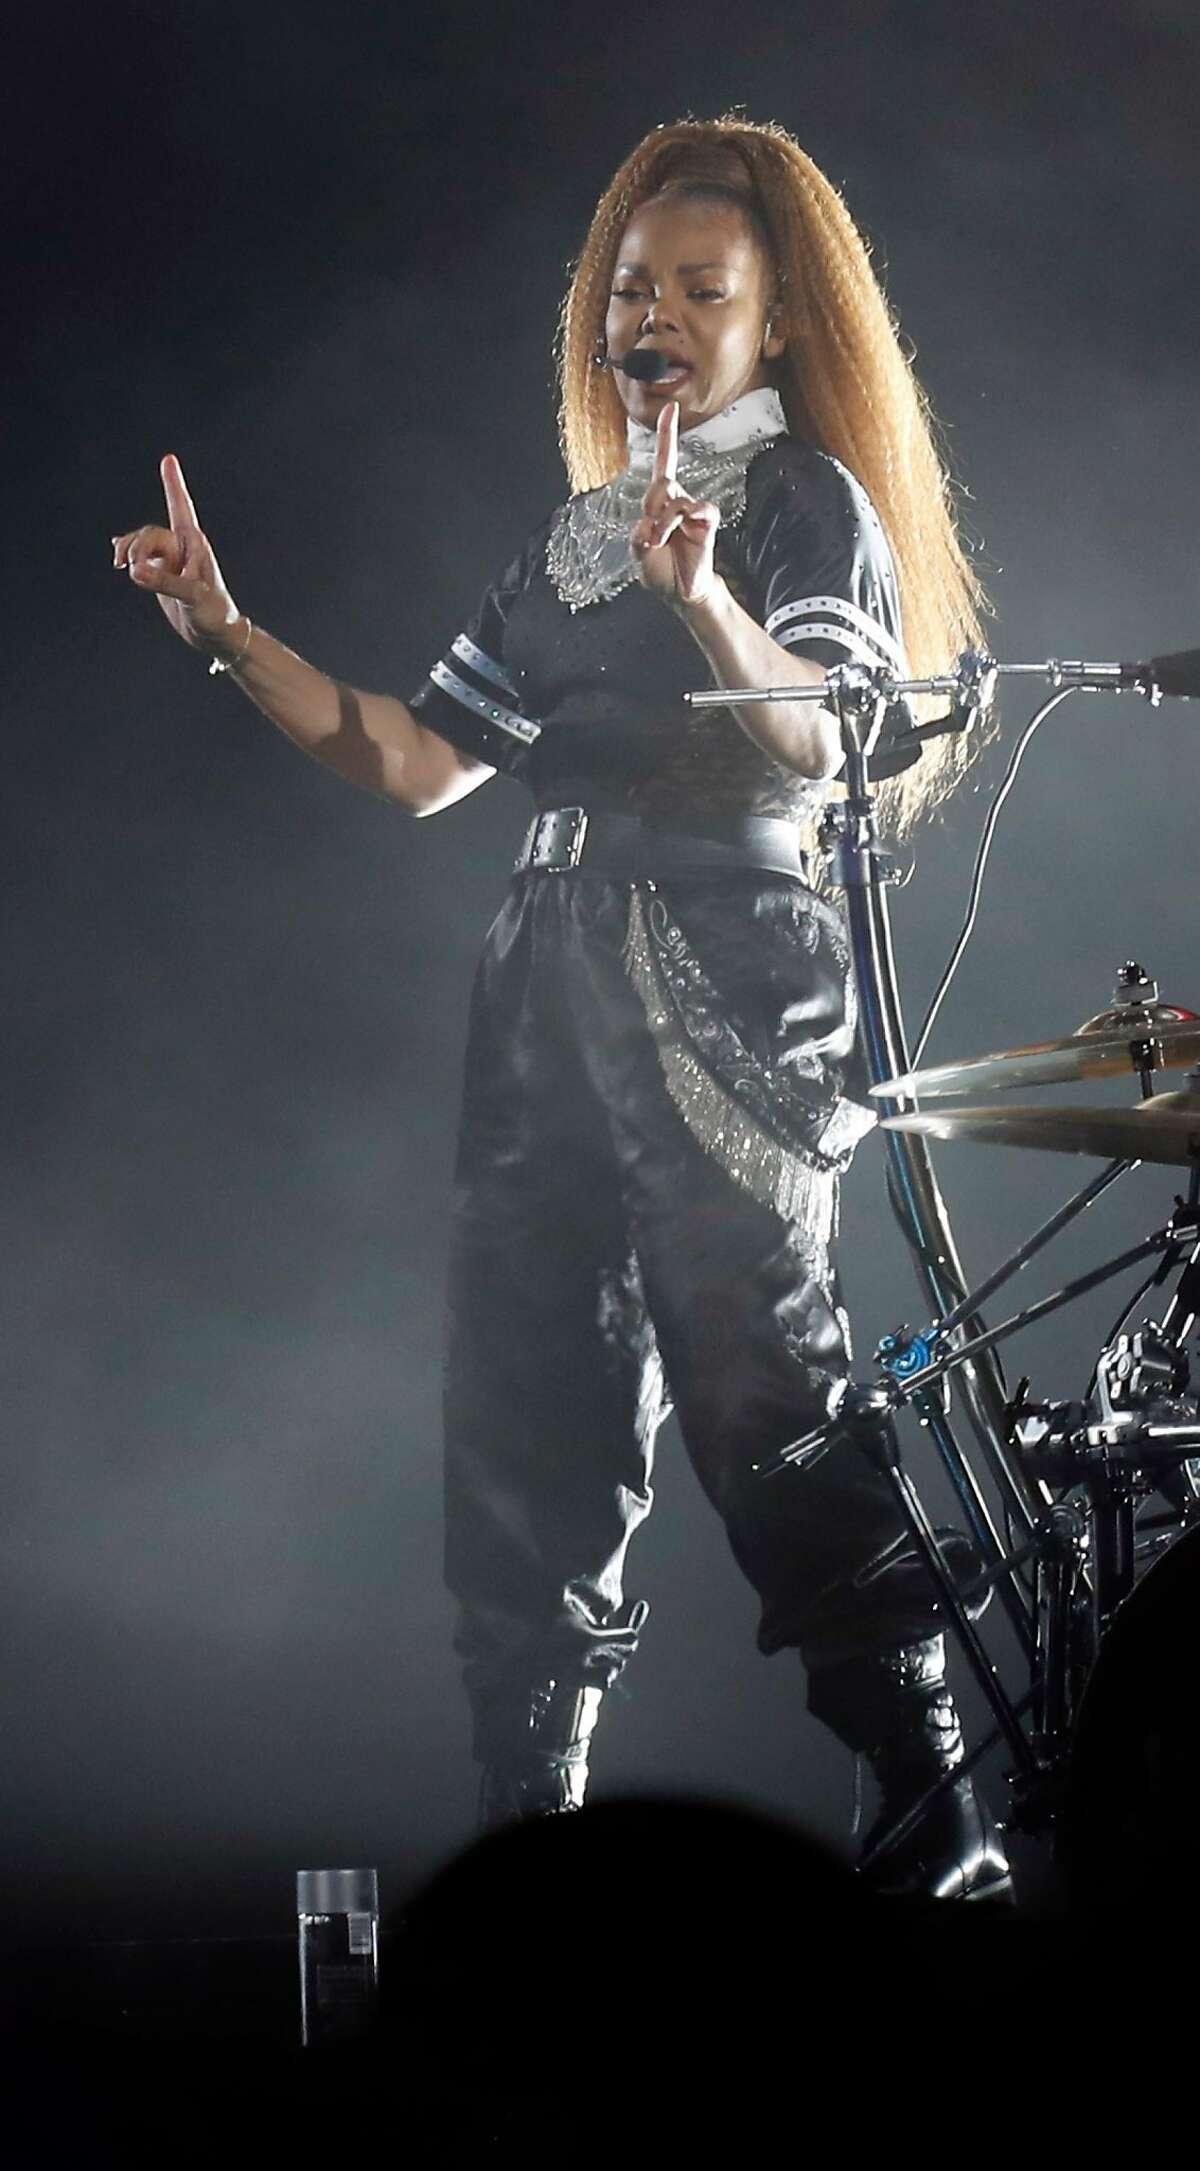 Janet Jackson plays Lands End stage during Outside Lands in Golden Gate Park in San Francisco, Calif. on Sunday, August 12, 2018.